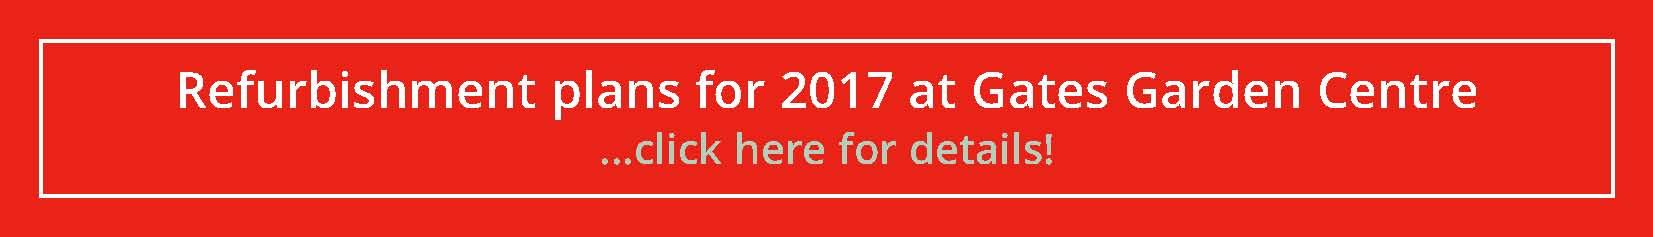 News Flash - Refurbishment Plans 2017